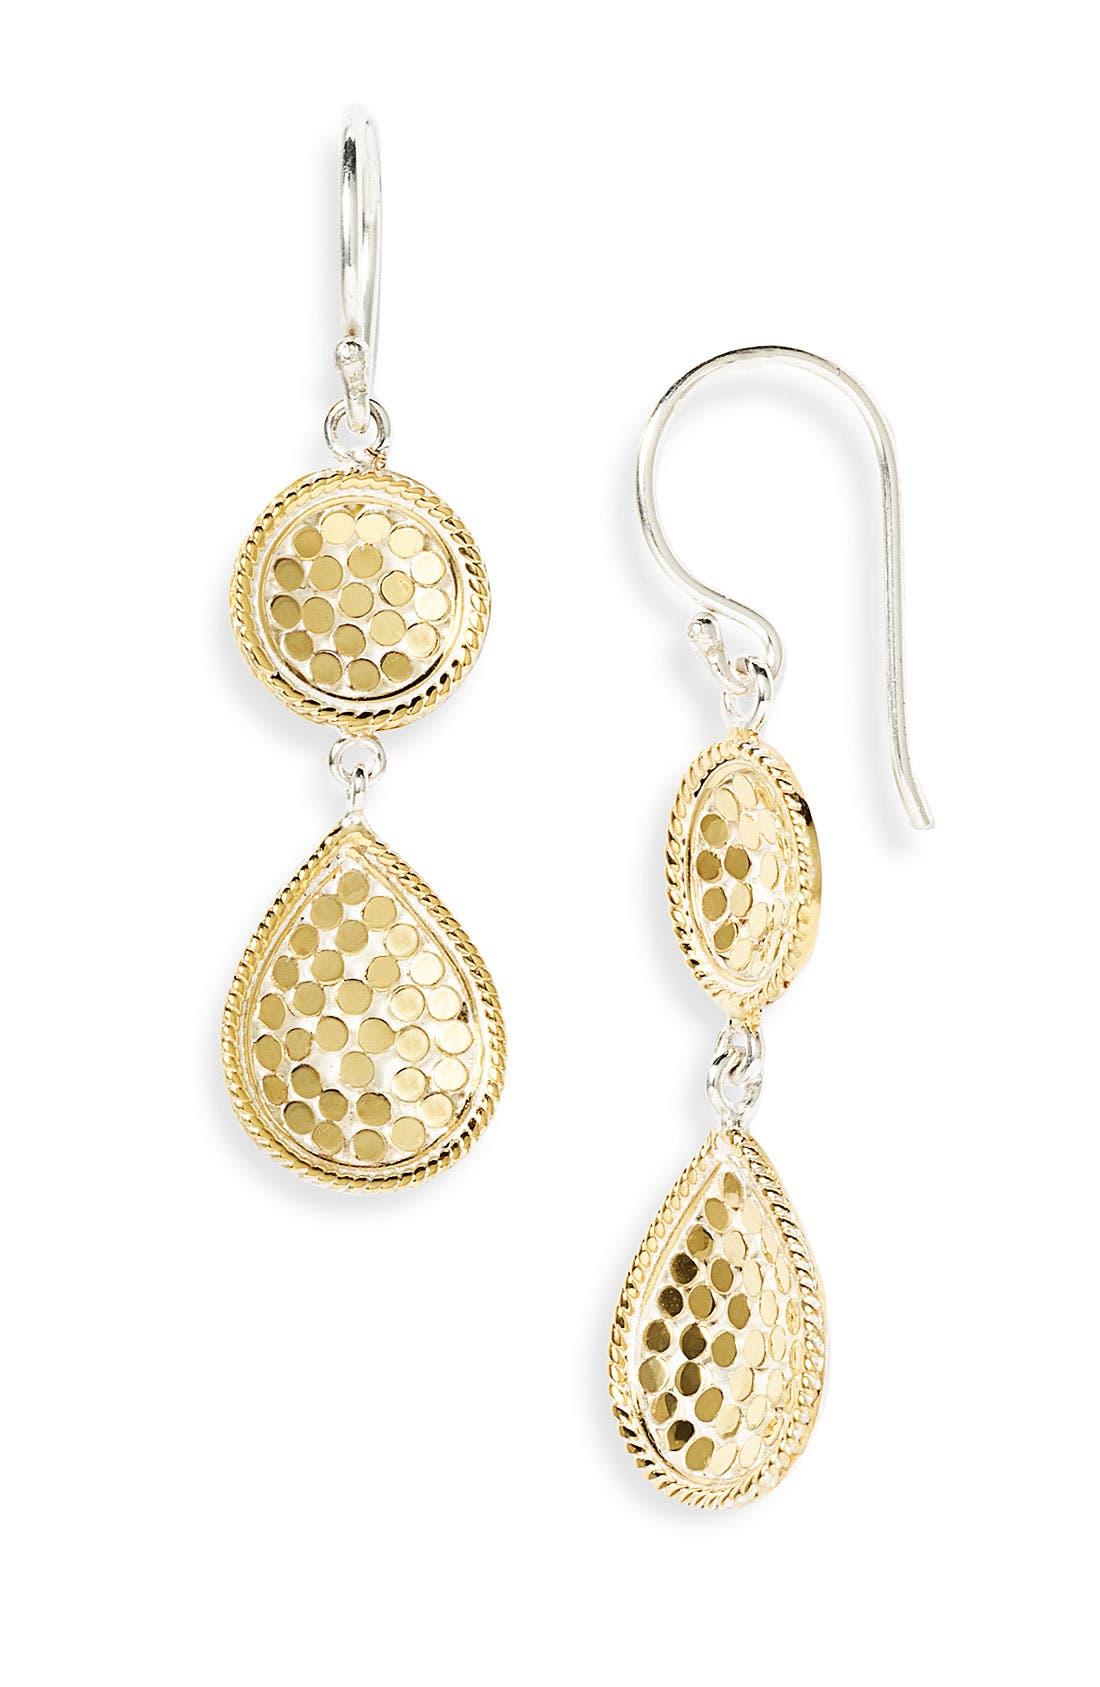 Main Image - Anna Beck 'Gili' Double Drop Earrings